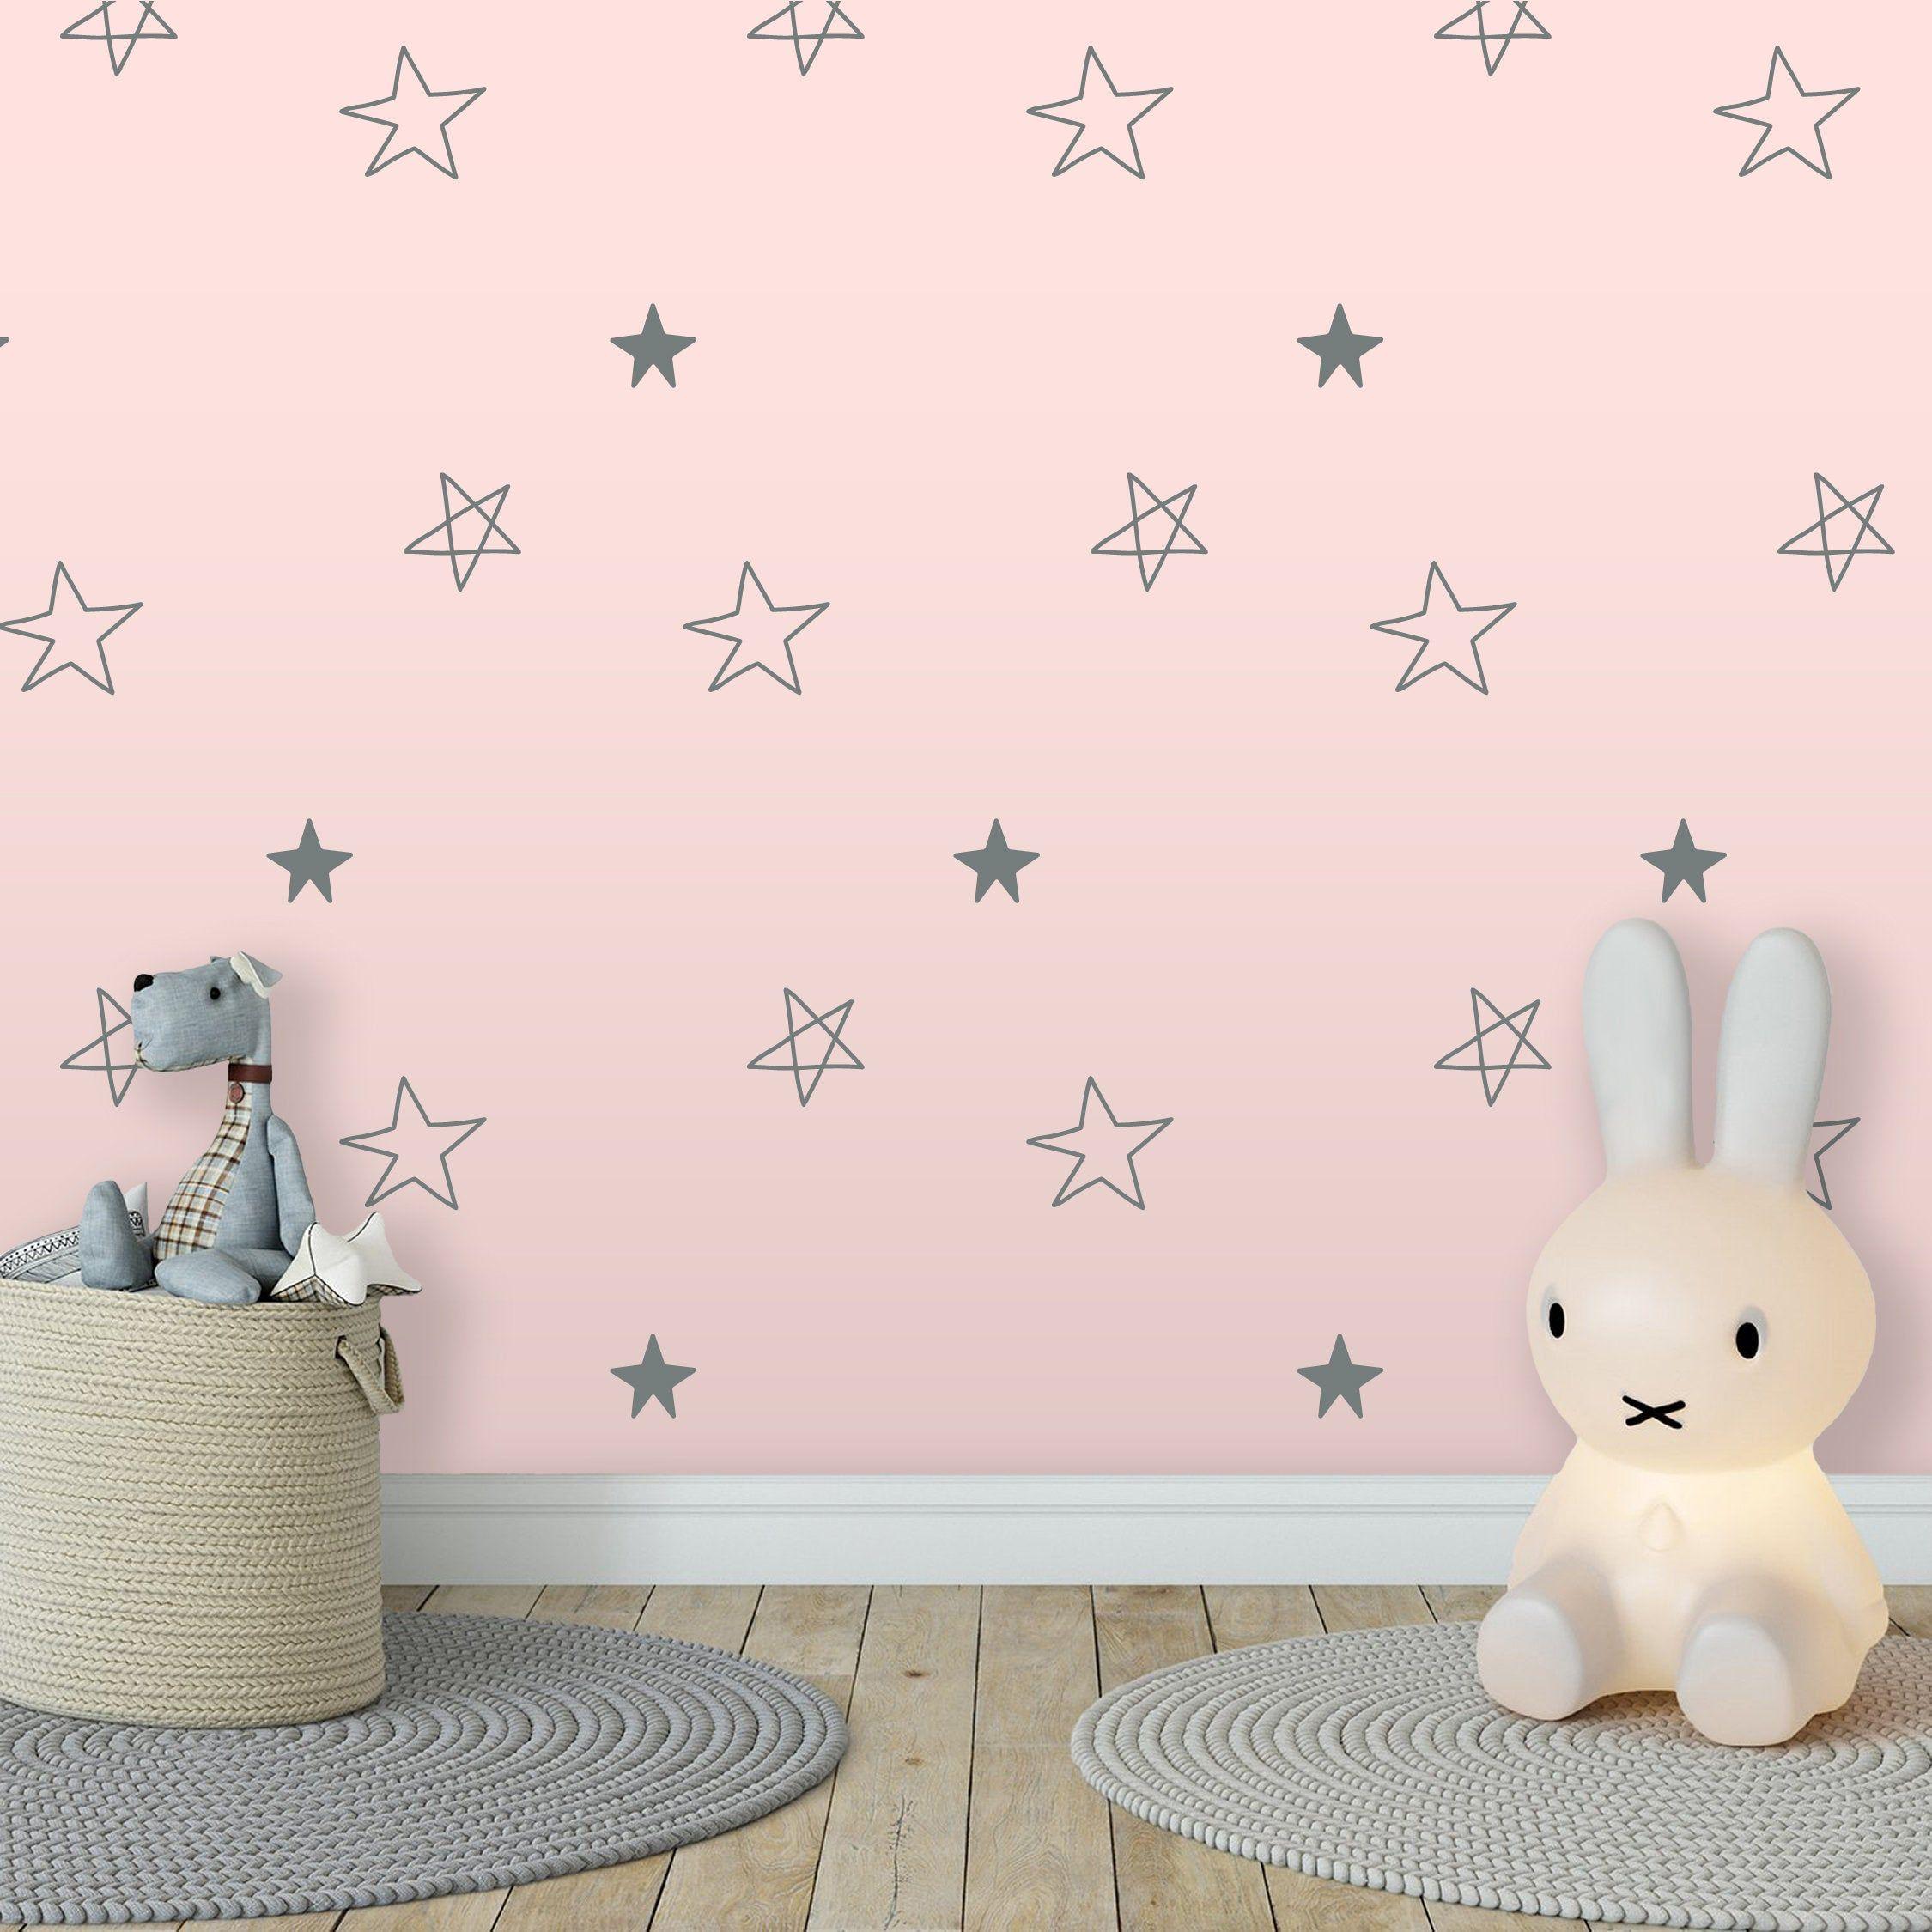 Star Drawing Pattern Decal Northern Star Wall Sticker Living Room Kid Room Nursery Bedroom Wallpaper Vinyl Wall Dec In 2020 Pattern Decal Vinyl Wall Decals Wall Decals #wall #art #stickers #for #living #room